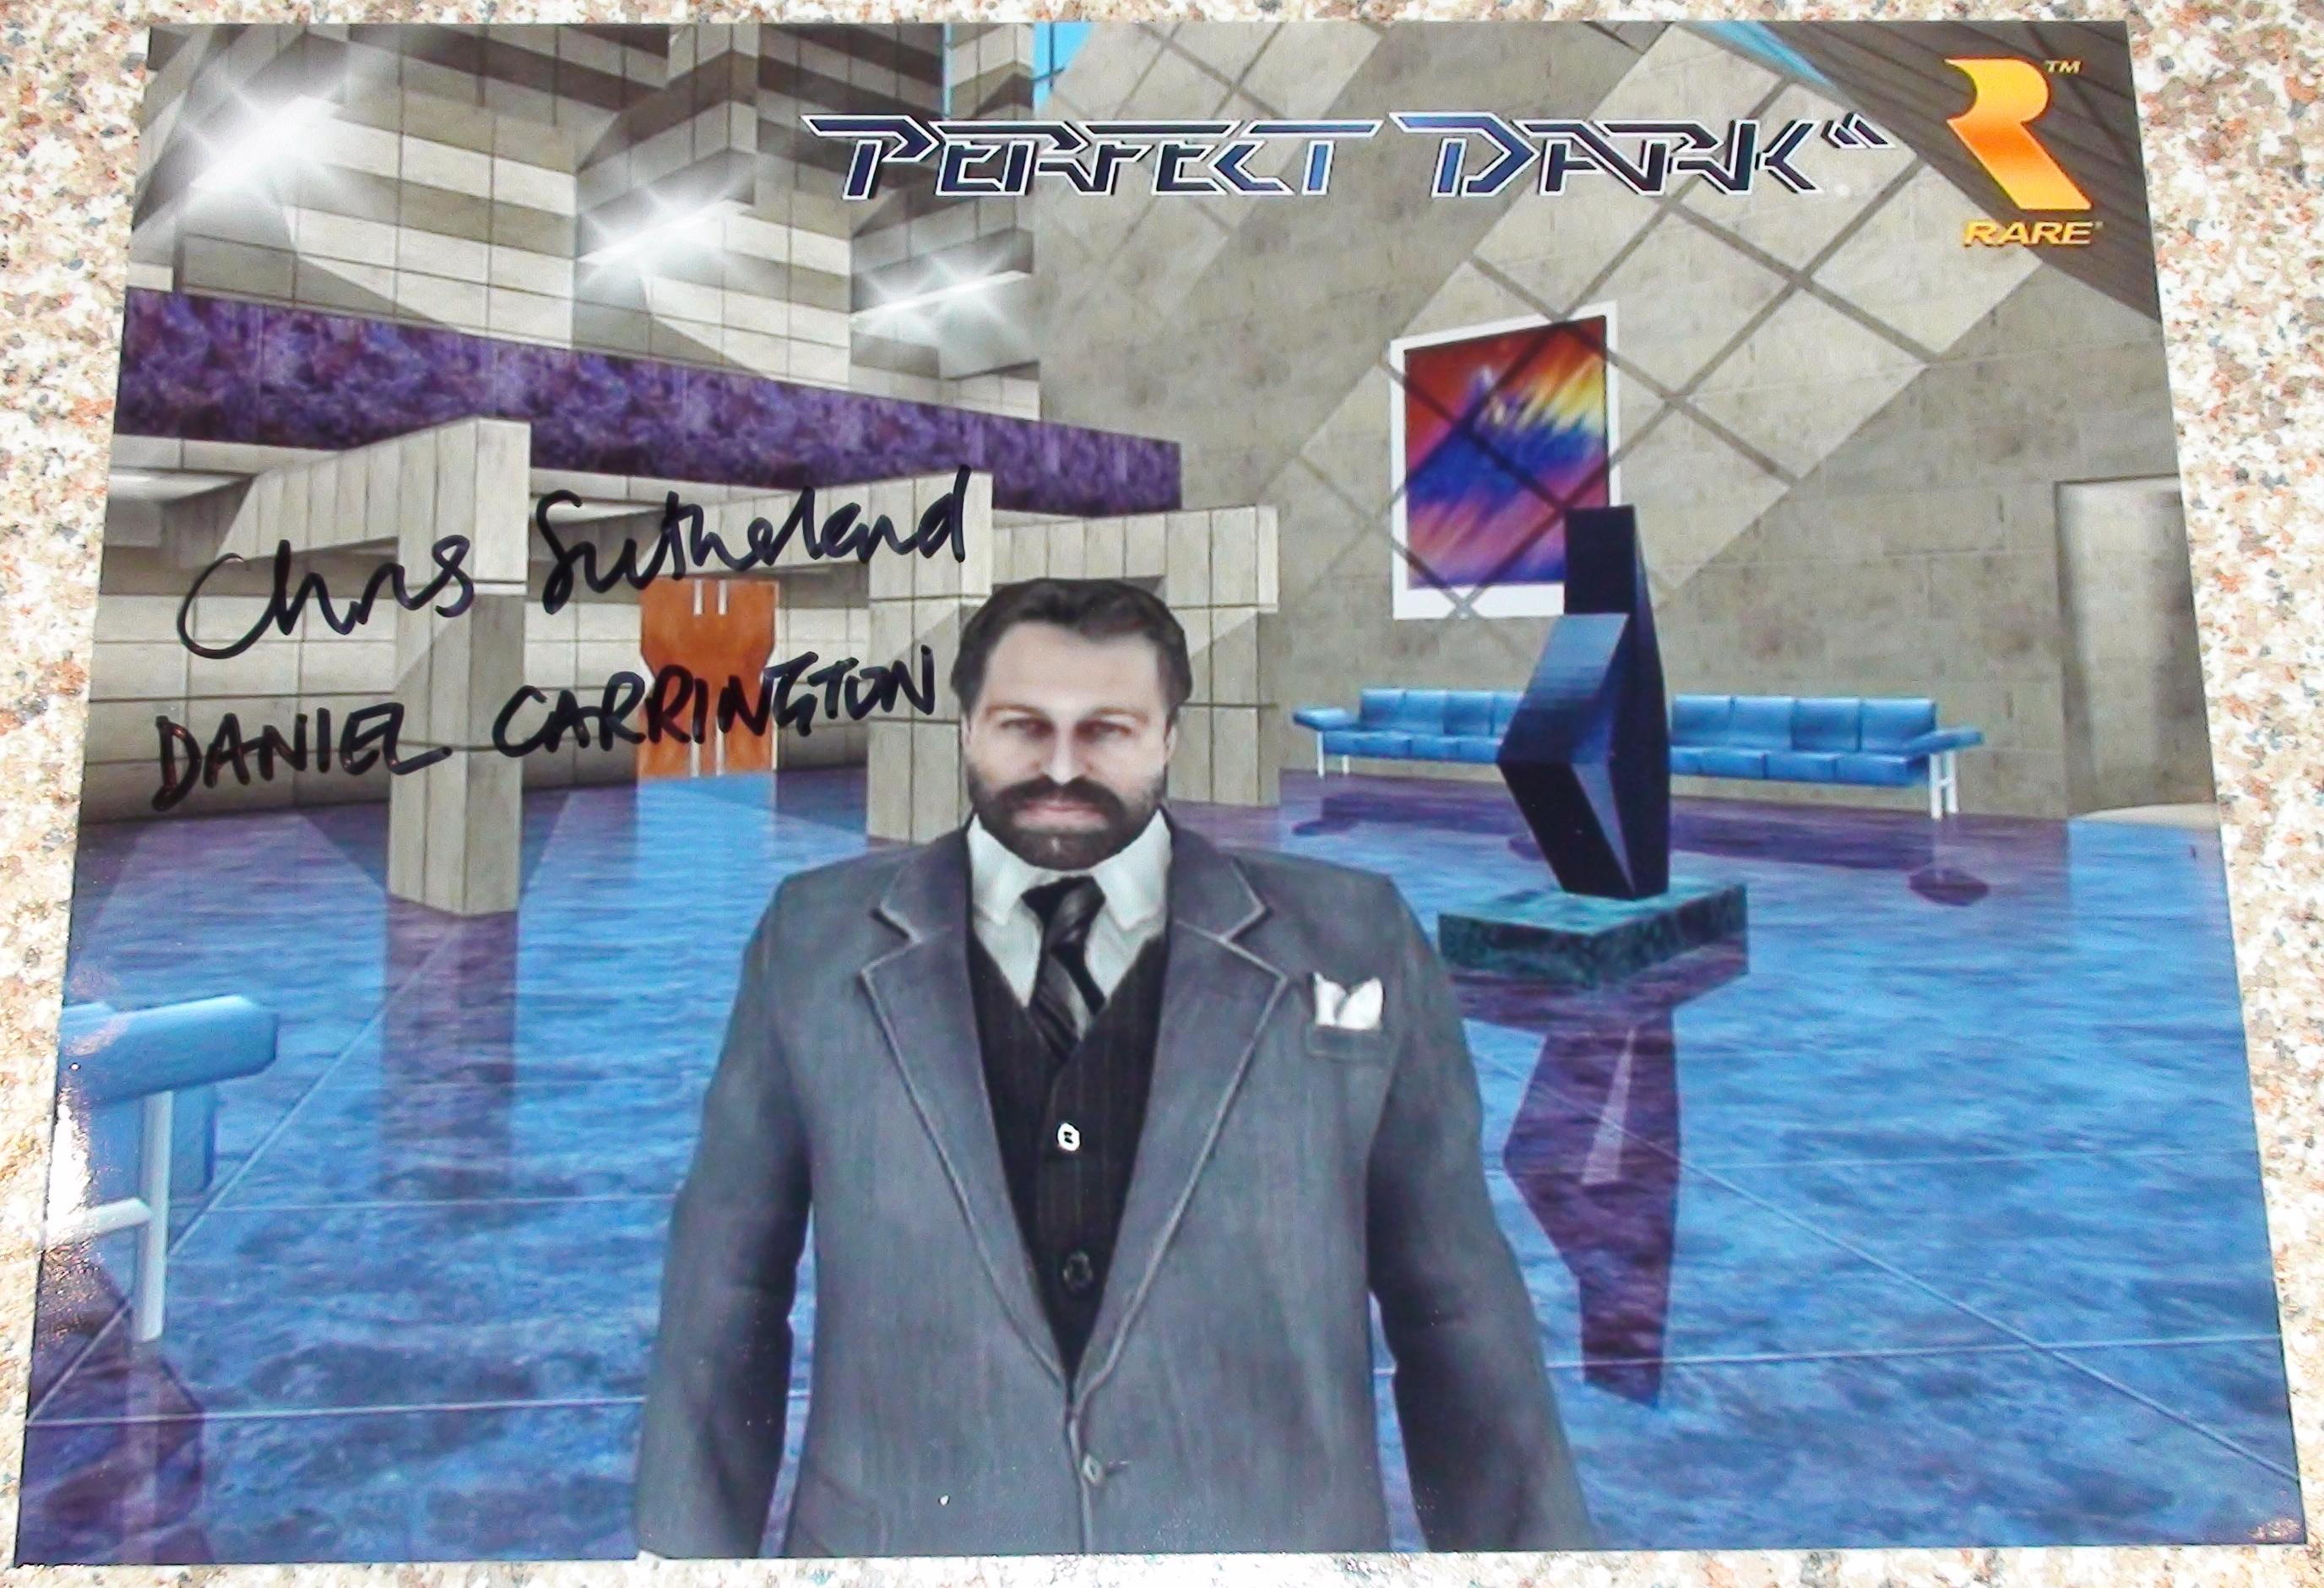 Perfect Dark - Daniel Carrington